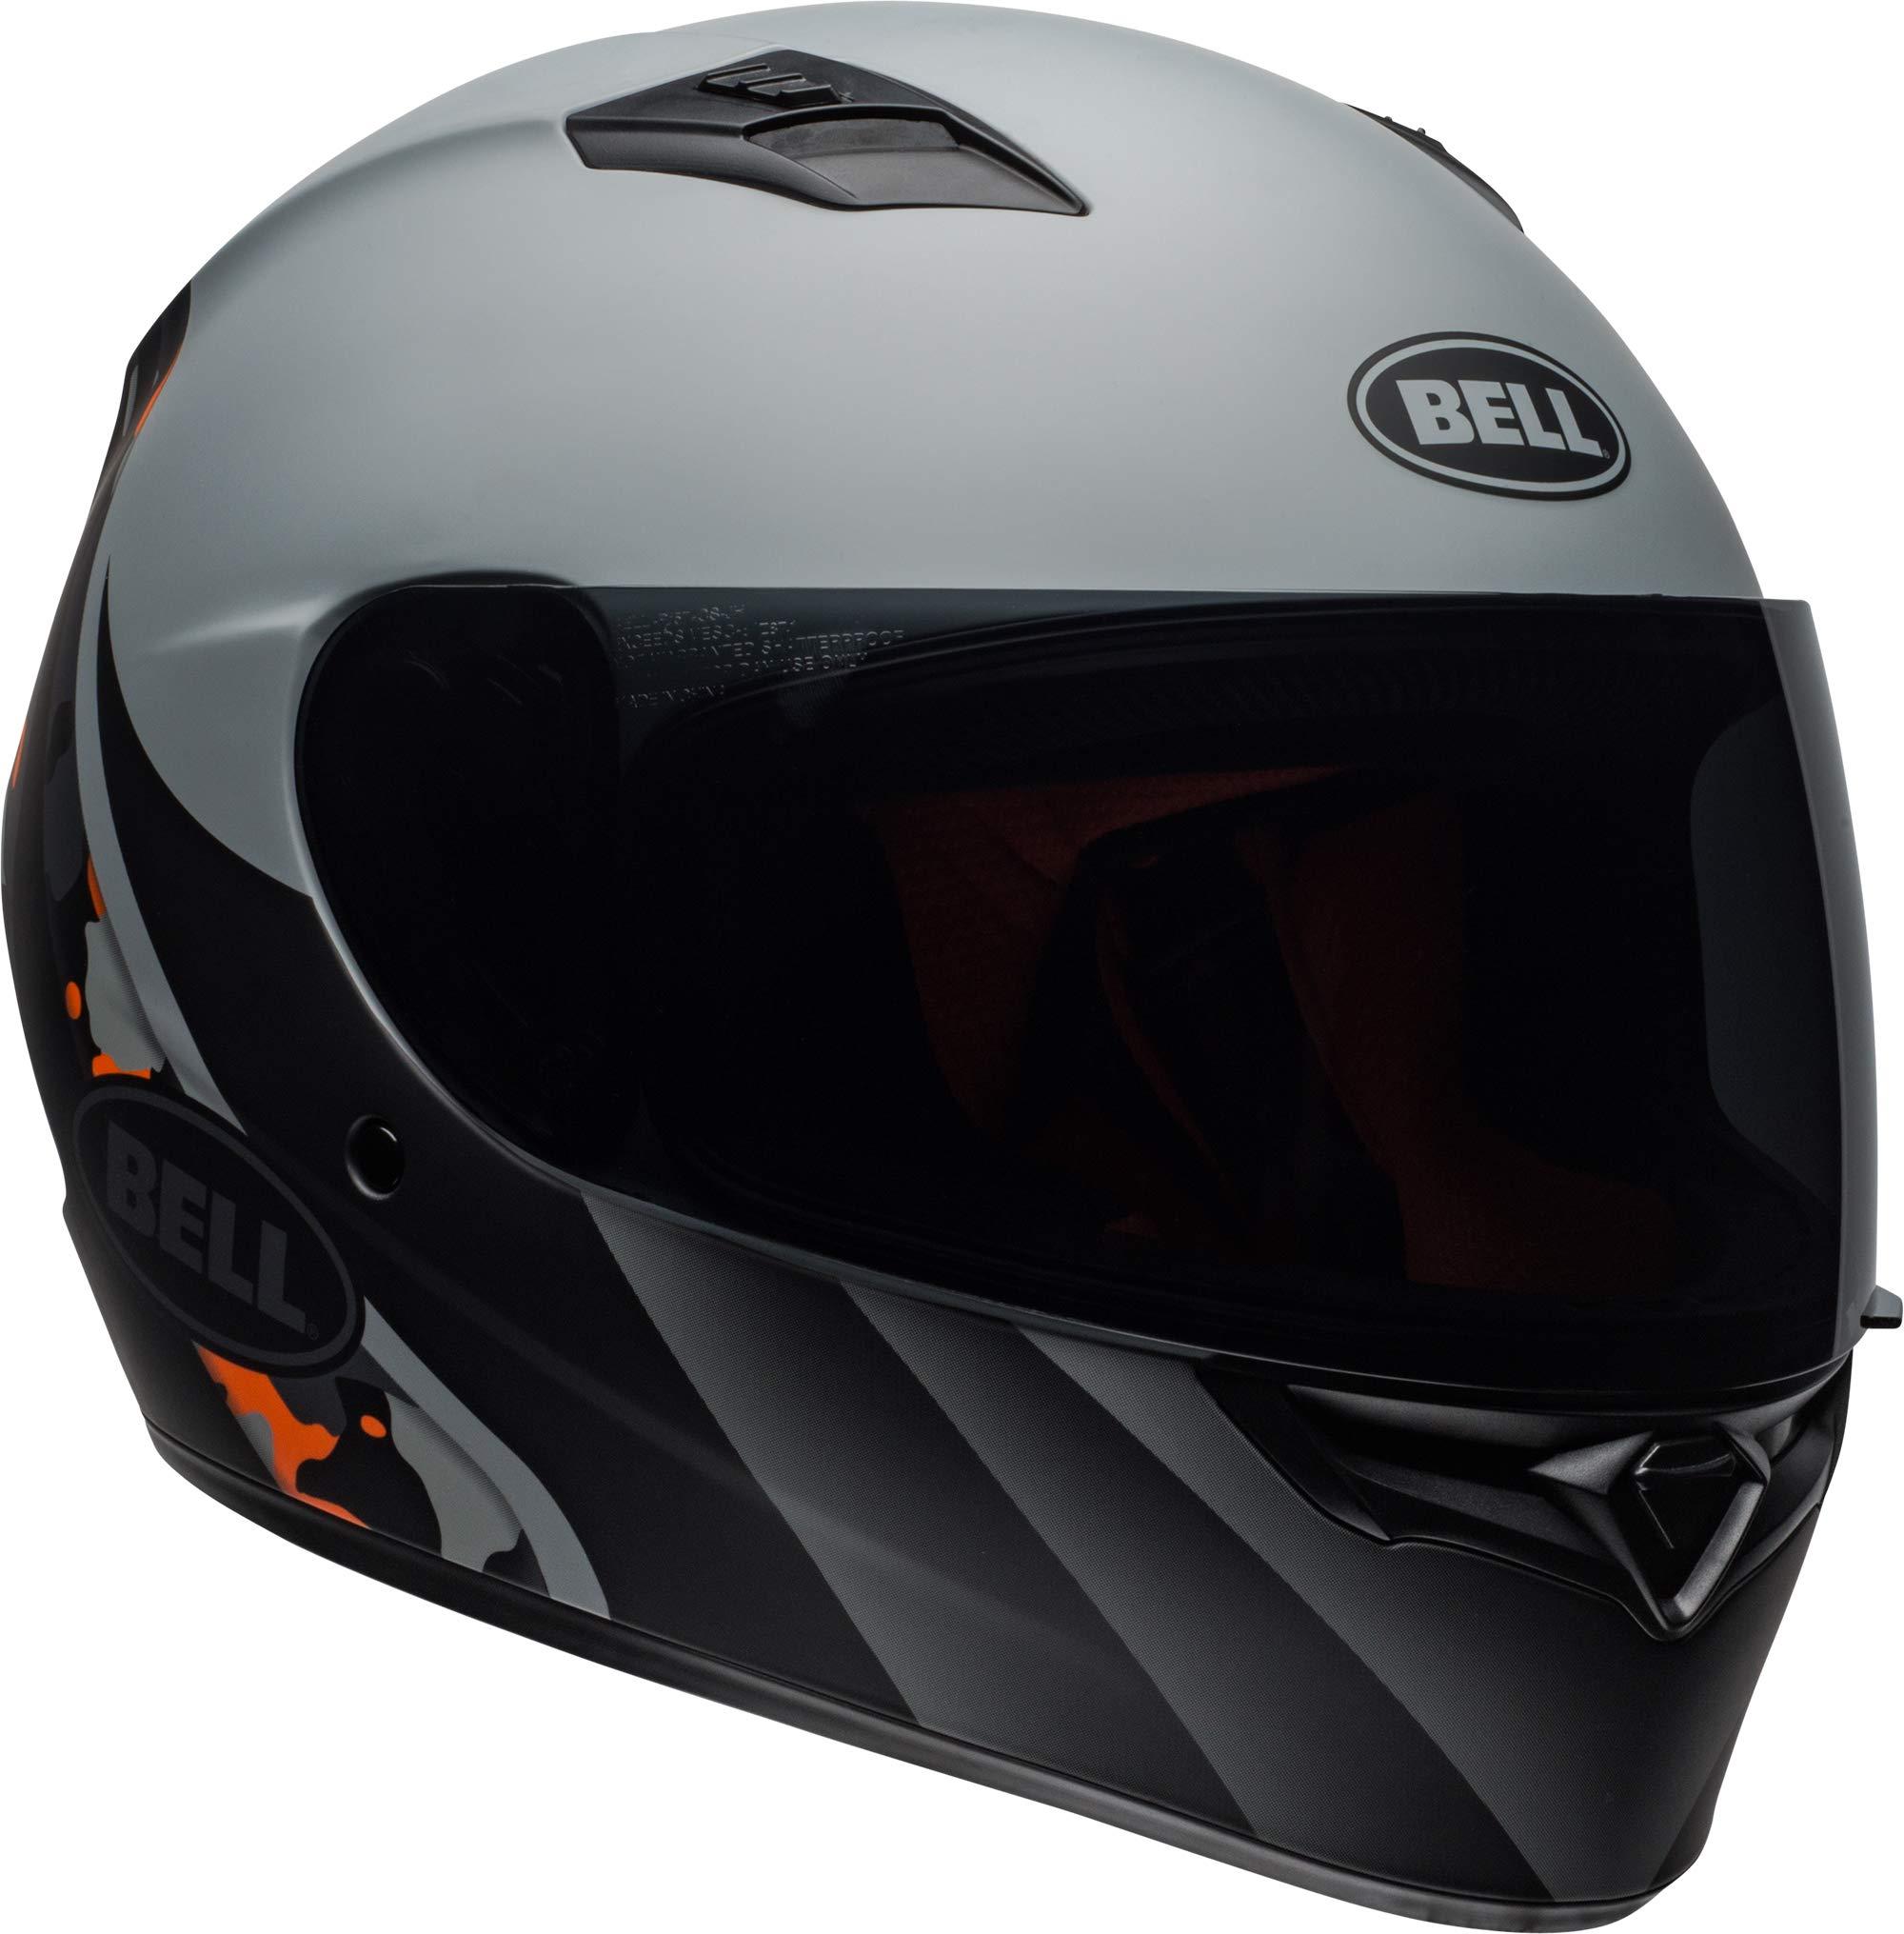 Bell Qualifier Helmet - Integrity (X-SMALL) (MATTE GREY/ORANGE CAMO)